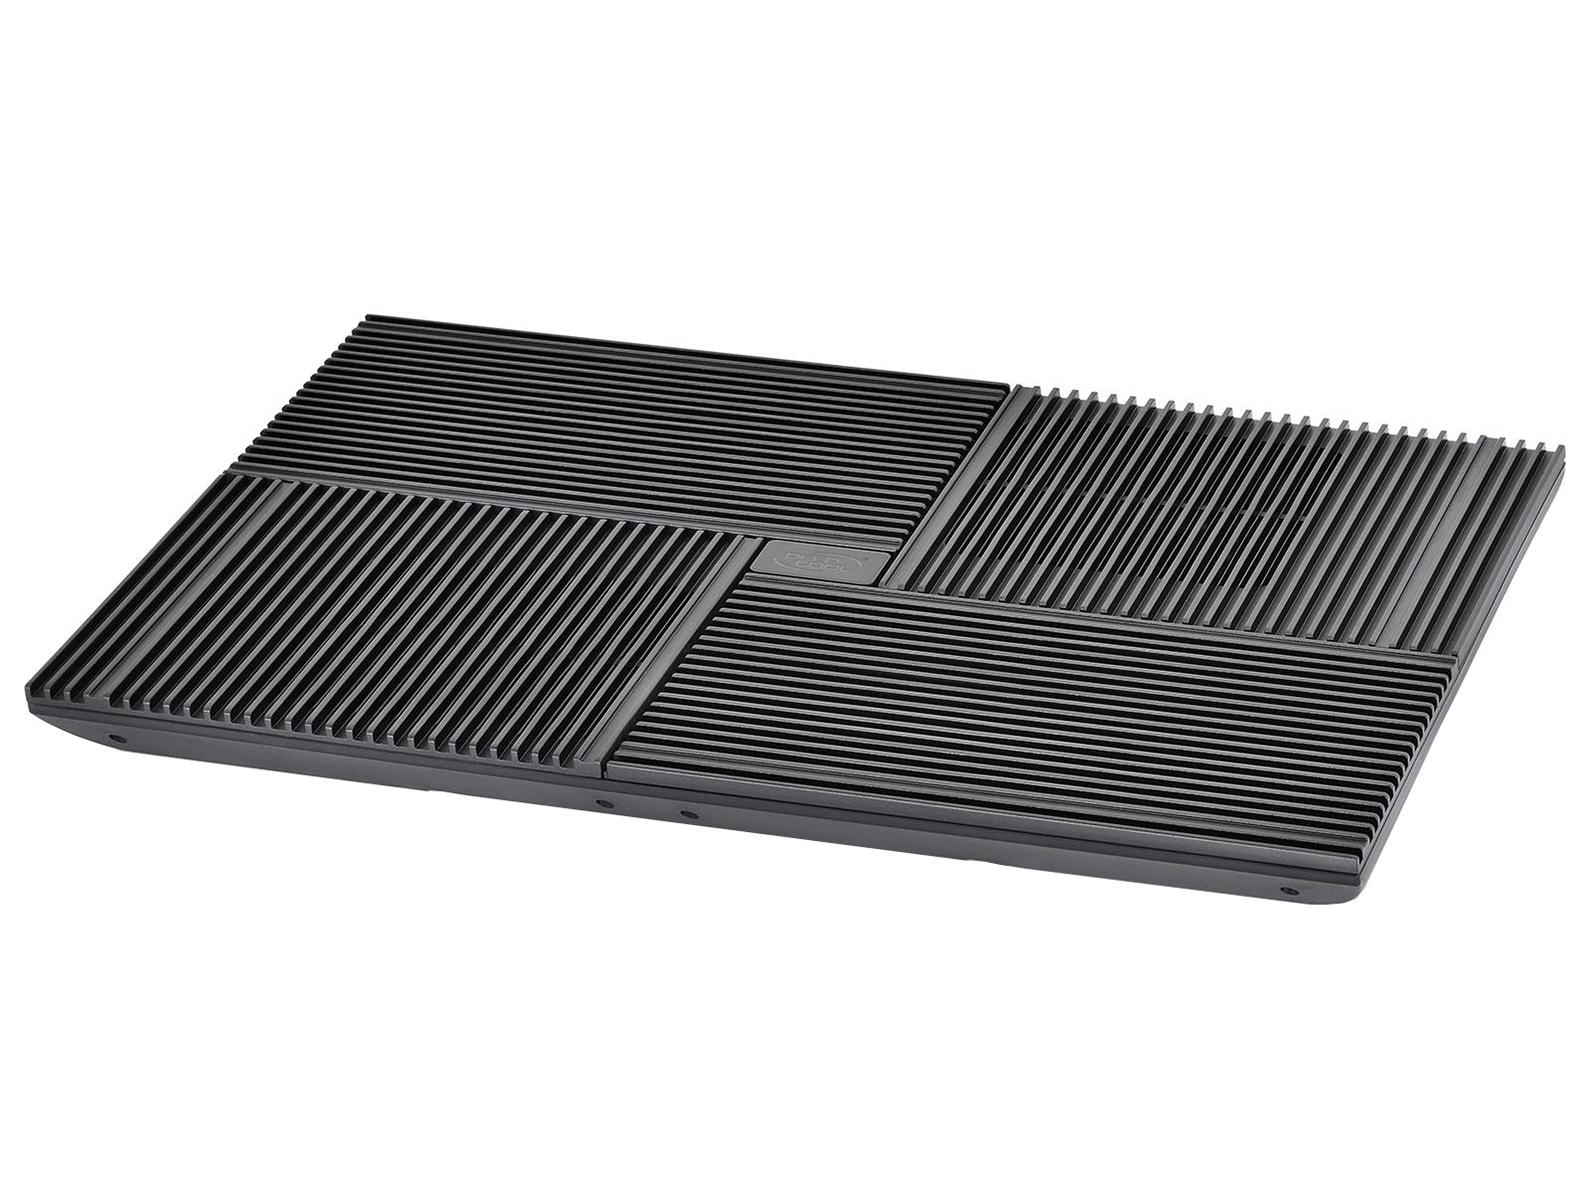 Подставка для ноутбука Deepcool Multi Core X8, Black deepcool охлаждающая подставка для ноутбука deepcool n8 black dp n24n n8bk 17